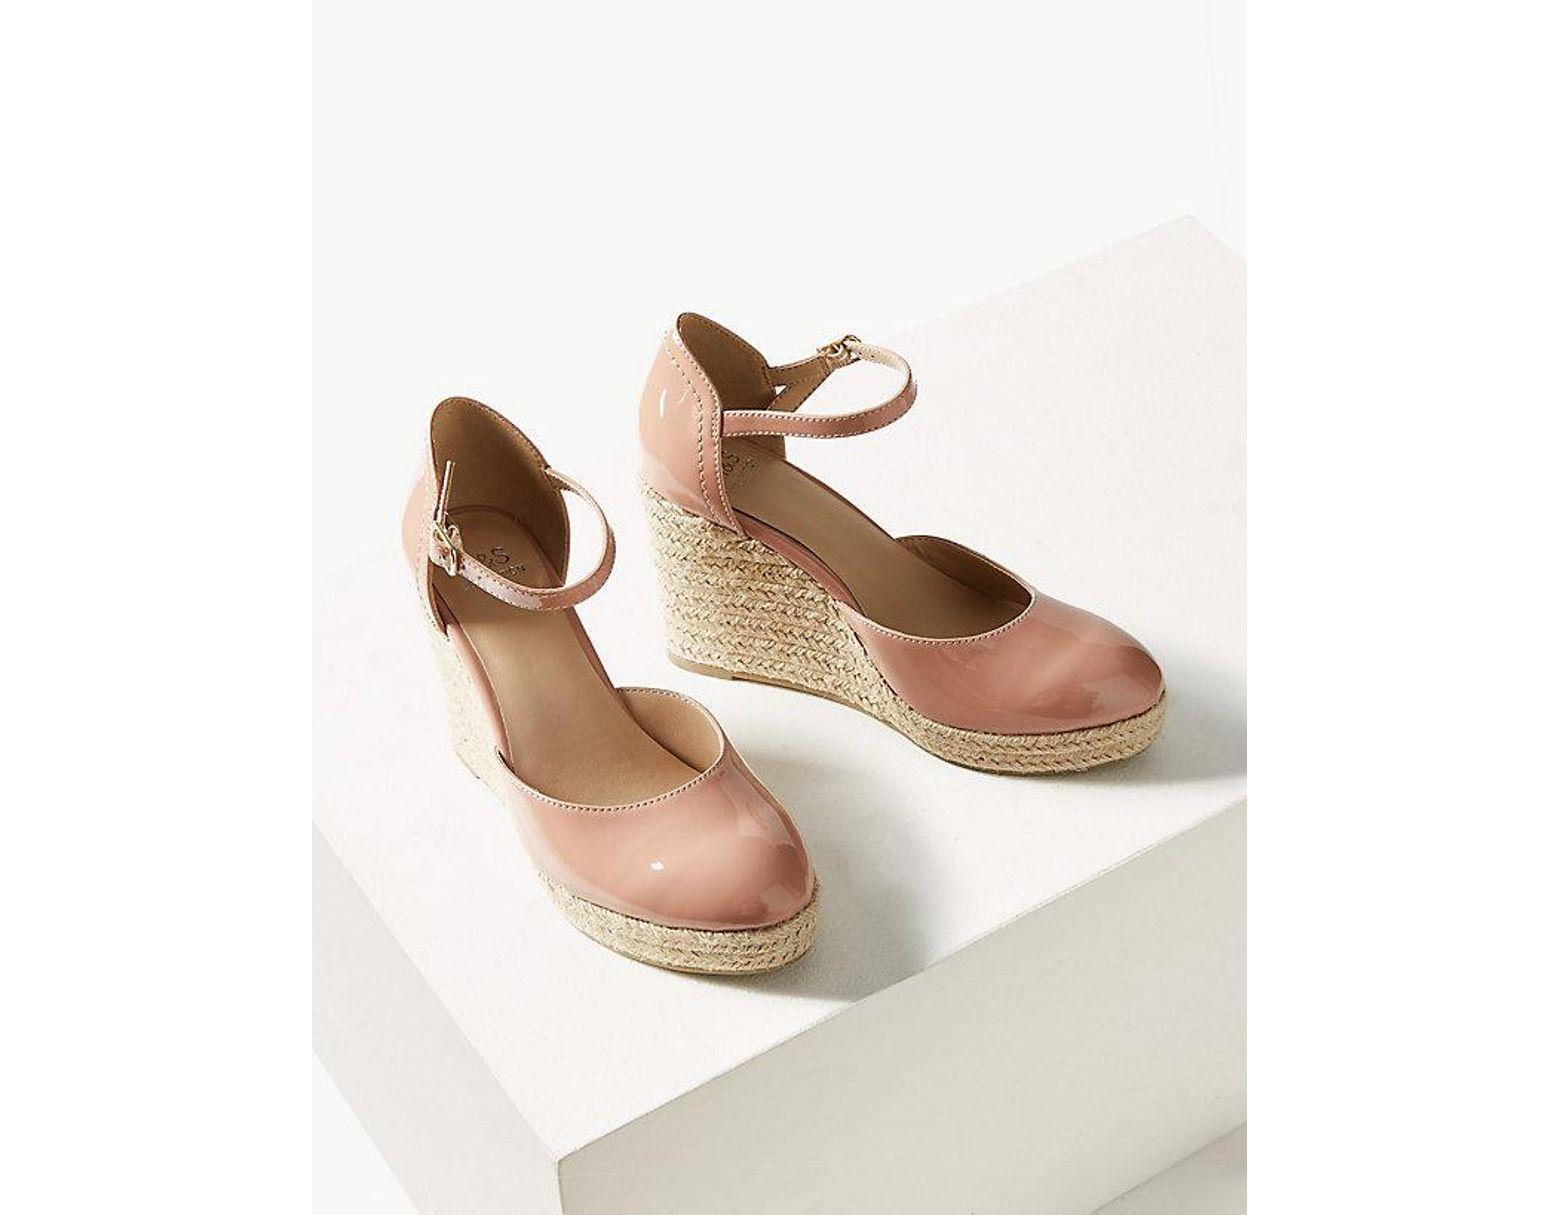 98859f629e7 Women's Natural Wedge Heel Almond Toe Espadrilles